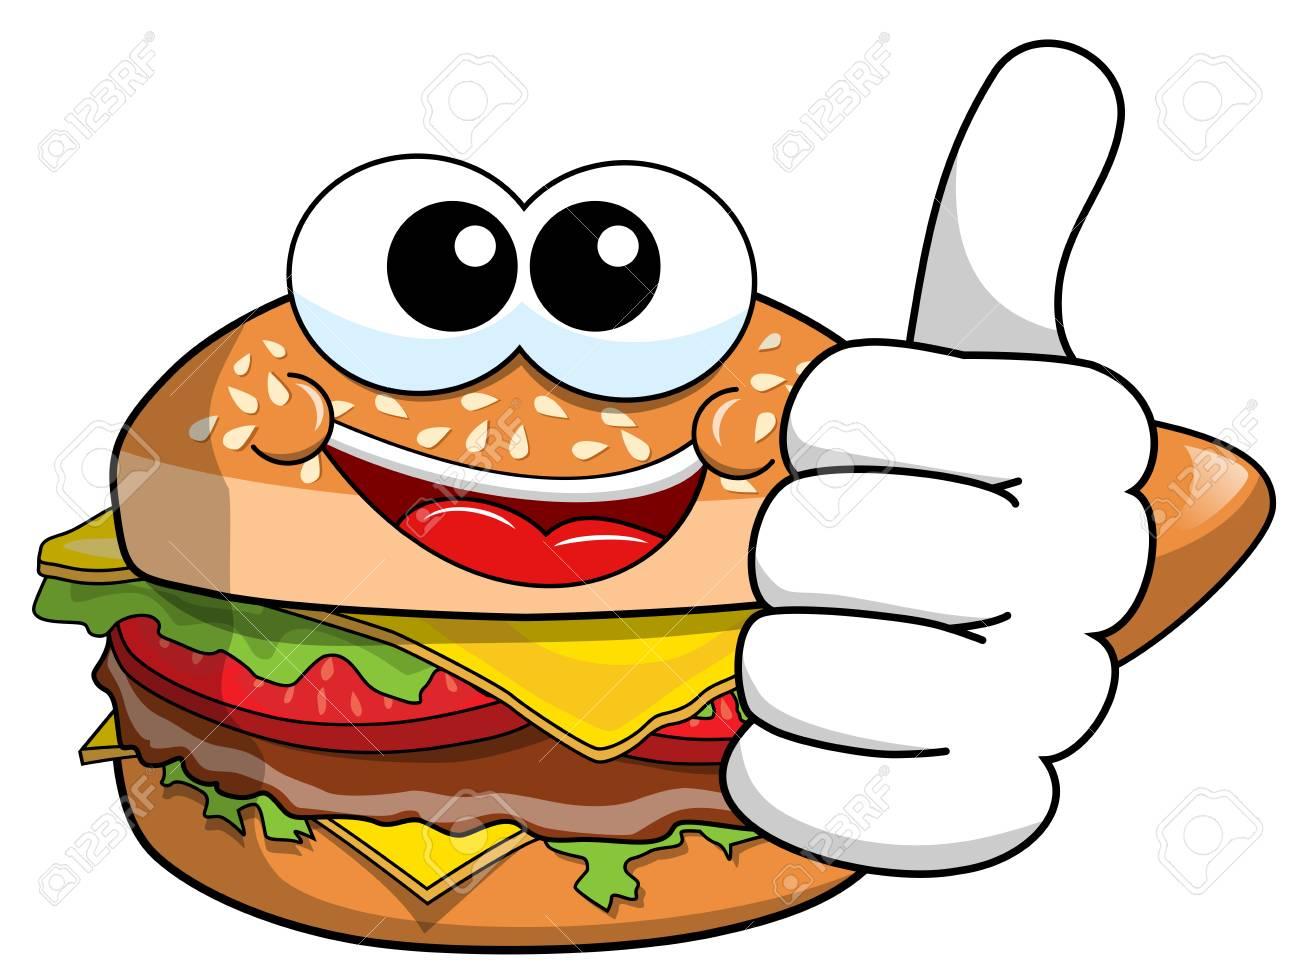 cartoon hamburger character thumb up isolated on white royalty free rh 123rf com cartoon hamburger pictures cartoon hamburger images